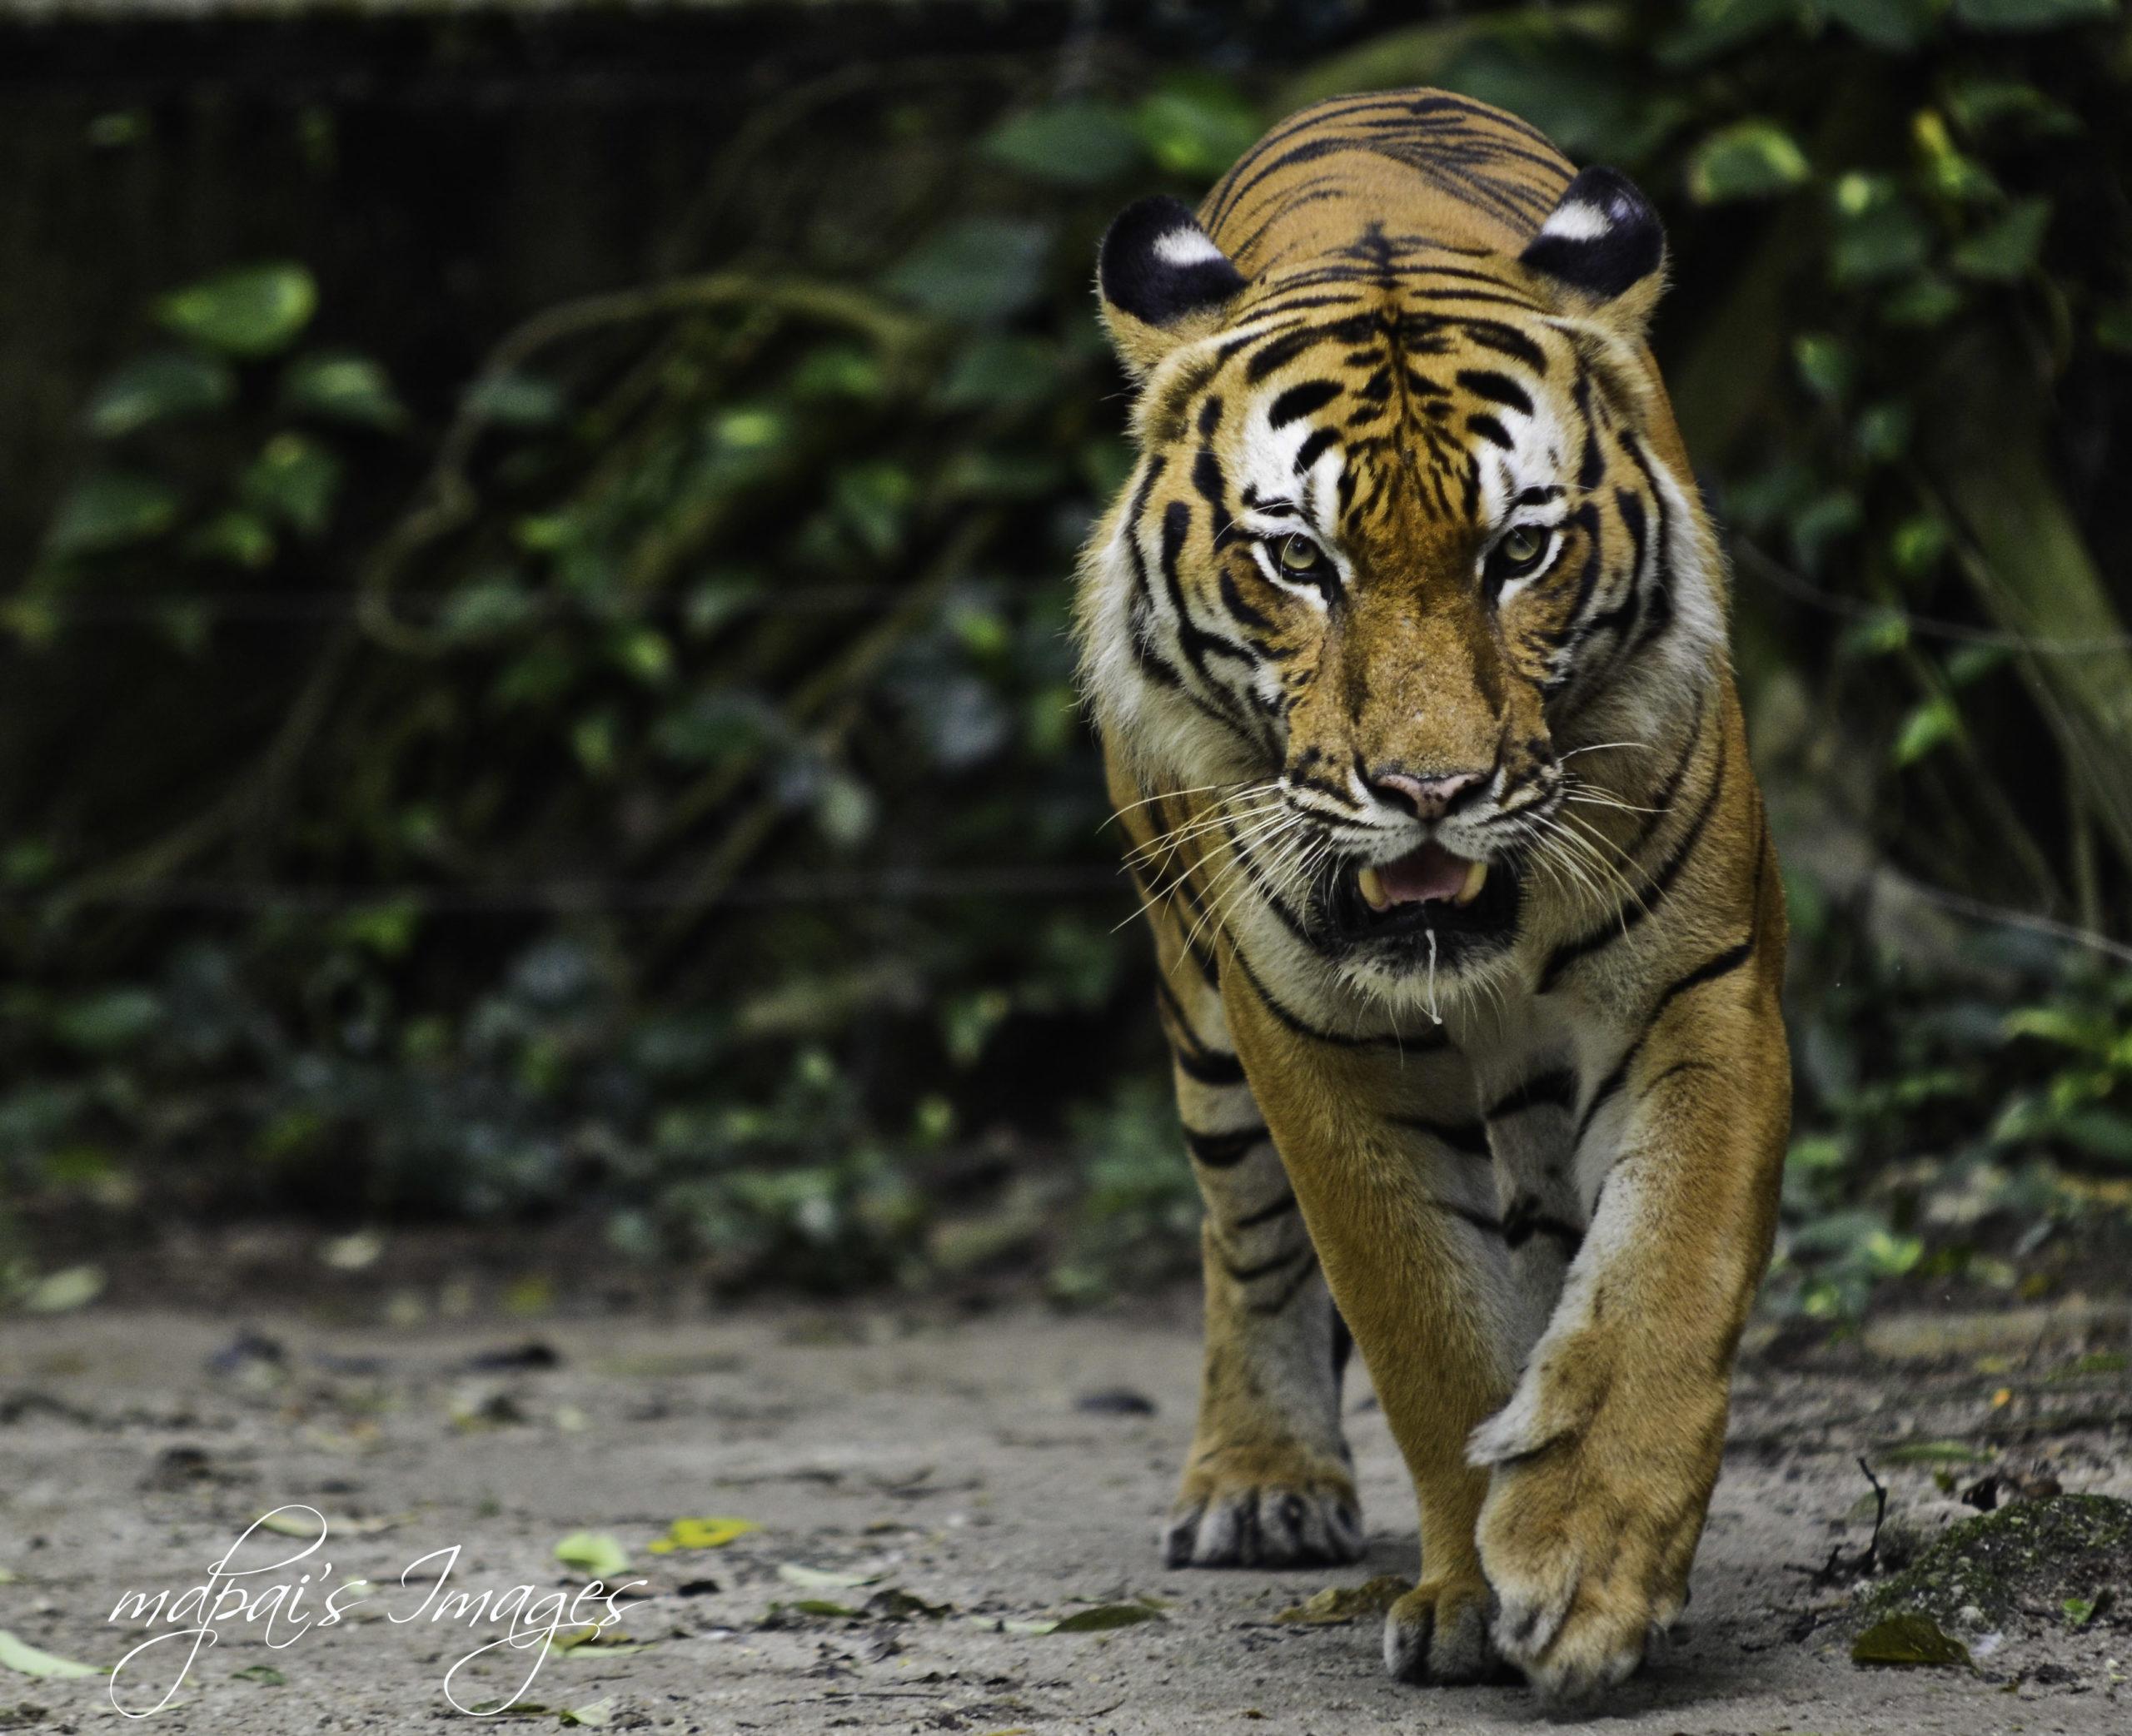 Wildlife trafficking, like everything else, has gone online during COVID-19